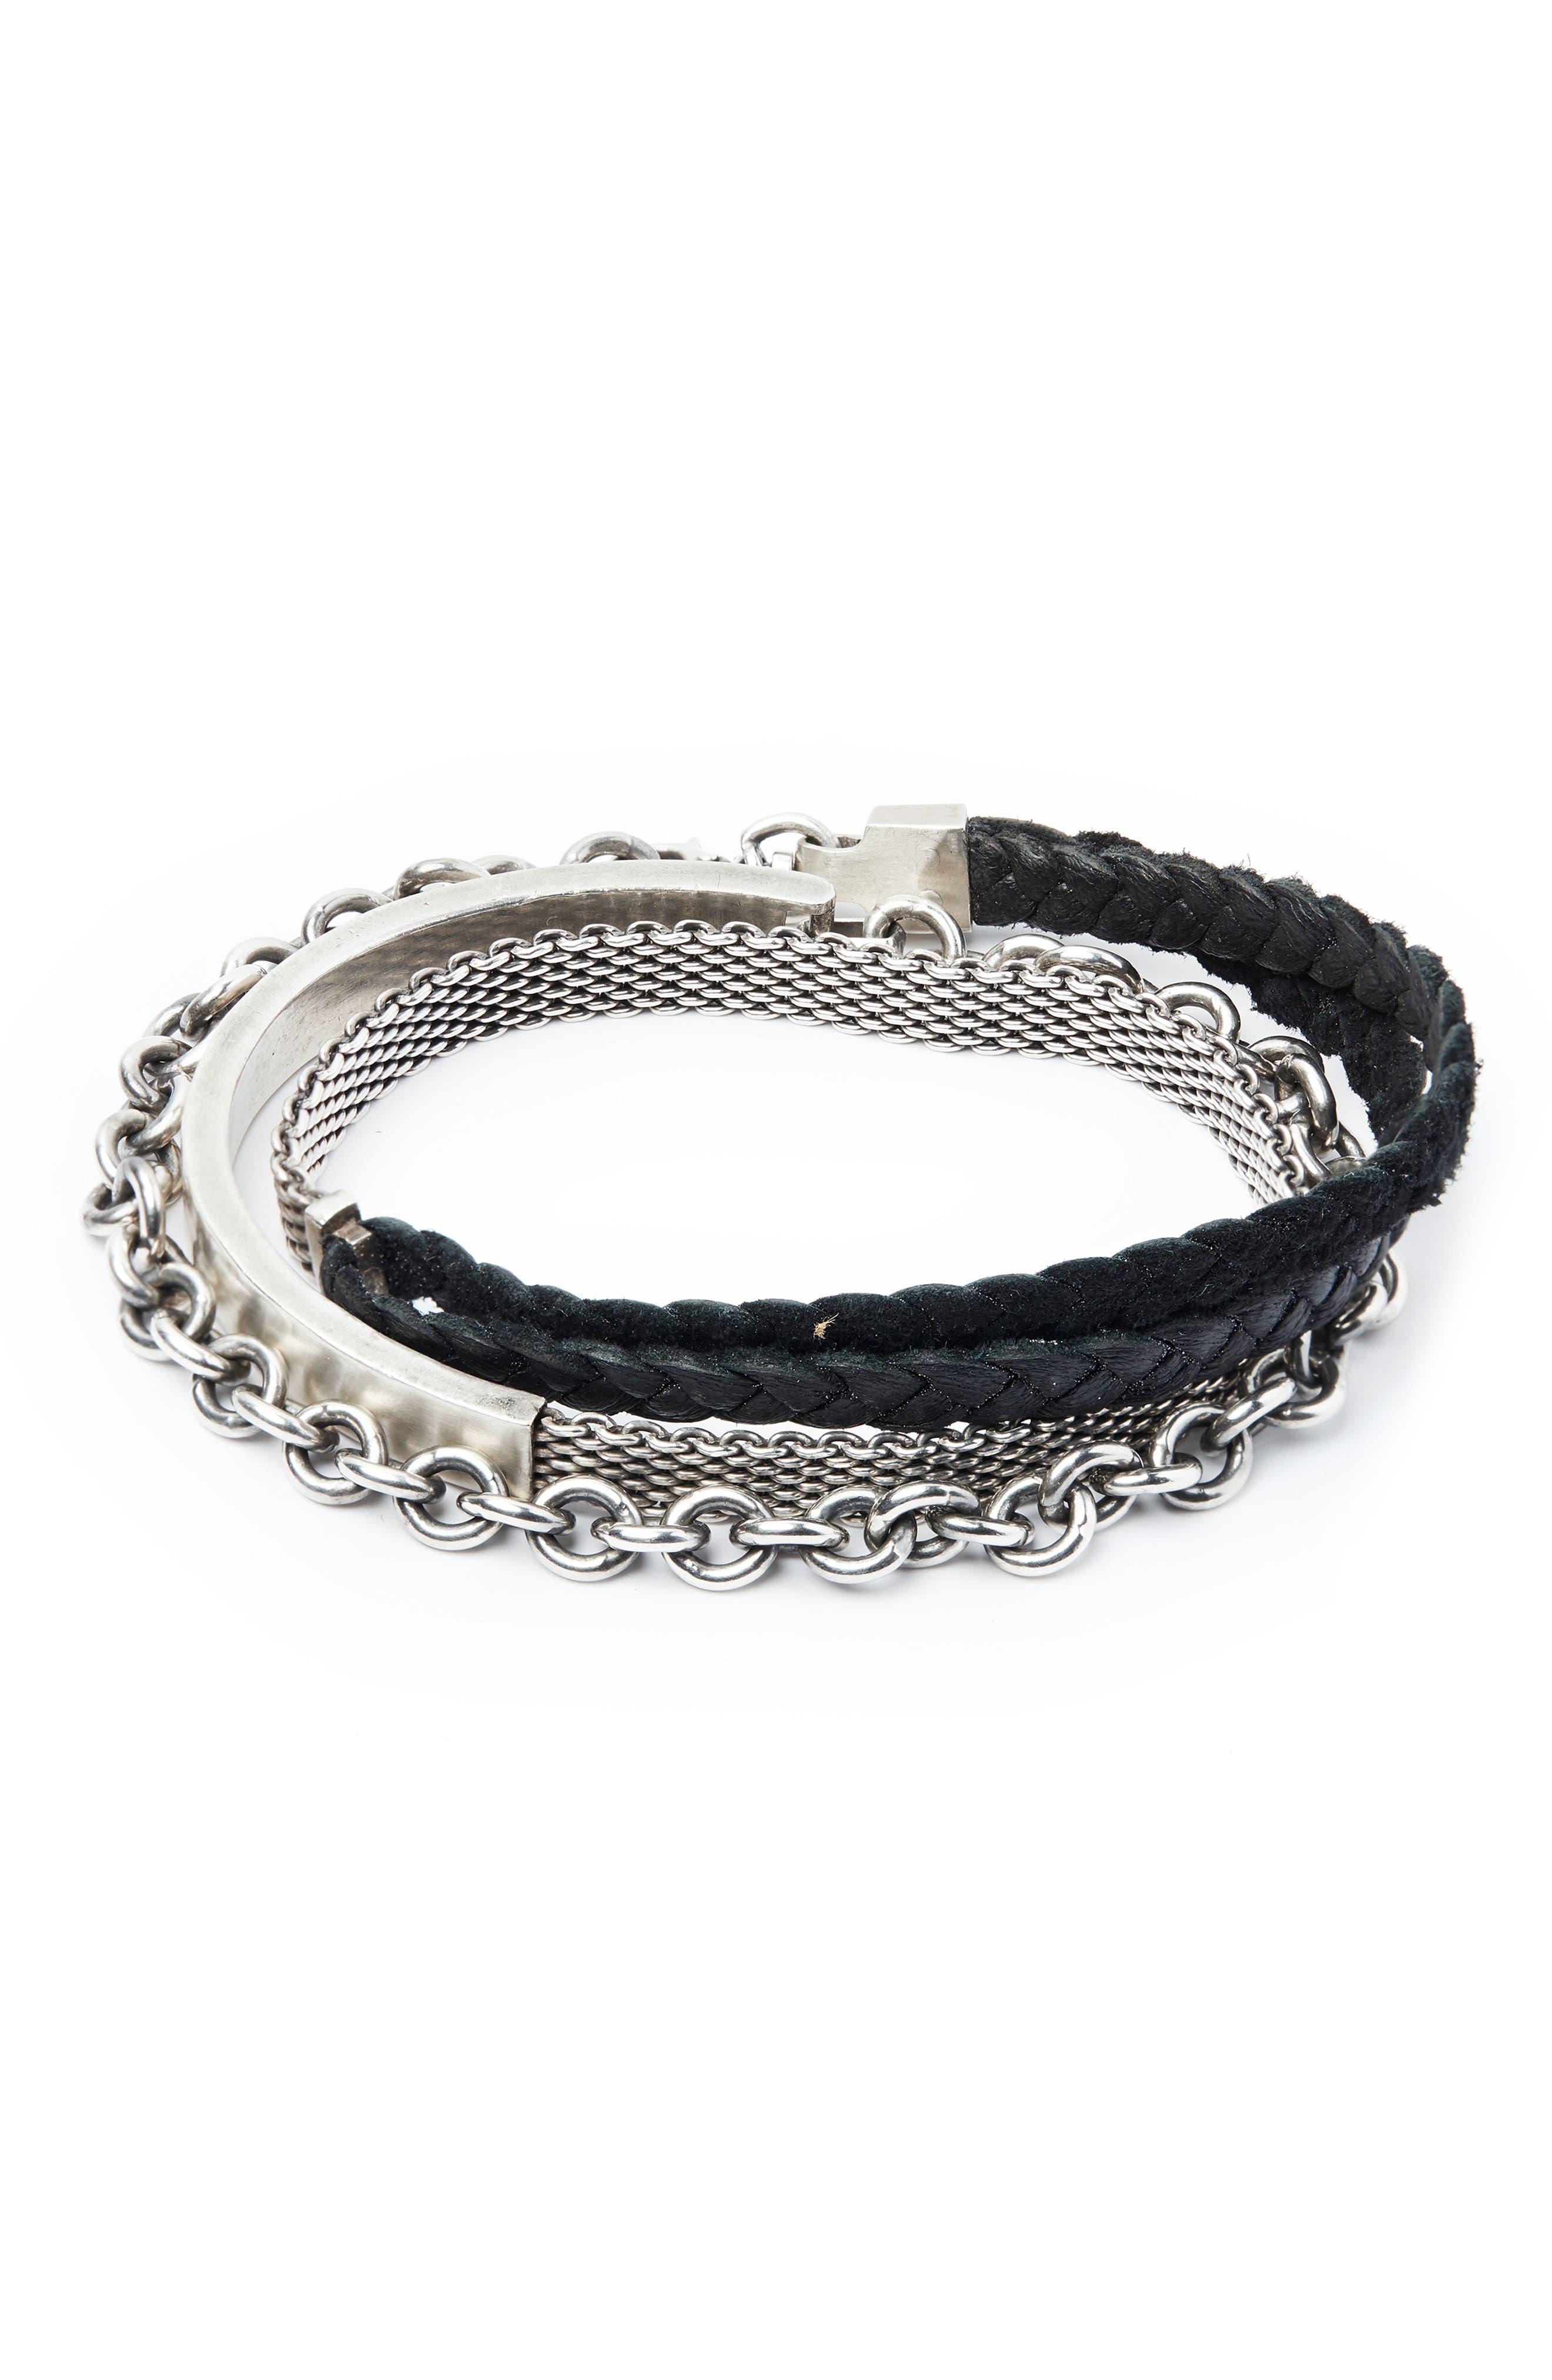 Signature Sterling Silver & Leather Wrap Bracelet,                             Main thumbnail 1, color,                             SILVER/ BLACK